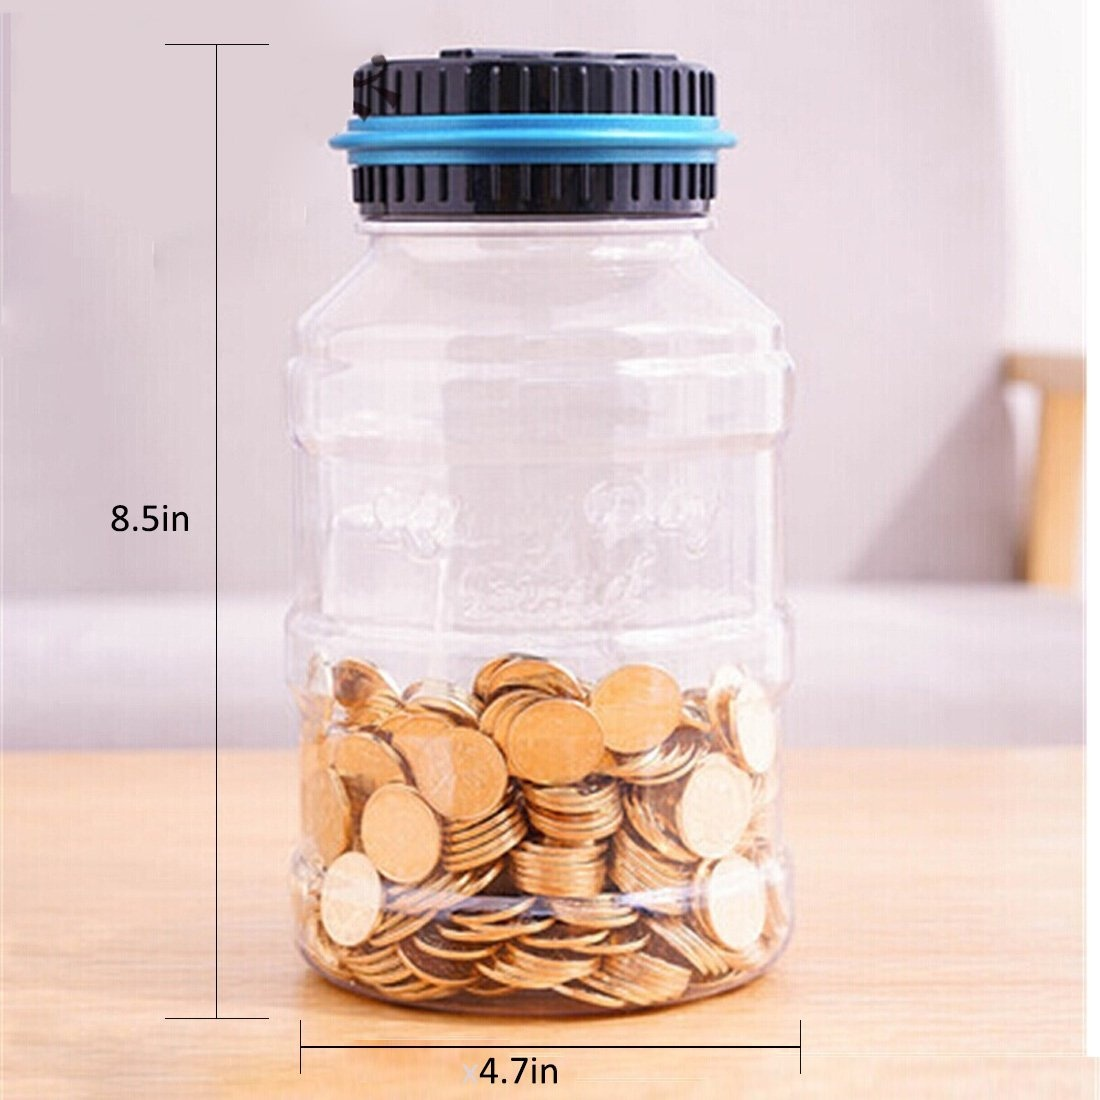 81fb26081ec4 AblueA Piggy Bank Digital Coin Bank Large Money Saving Box Jar Bank LED  Display